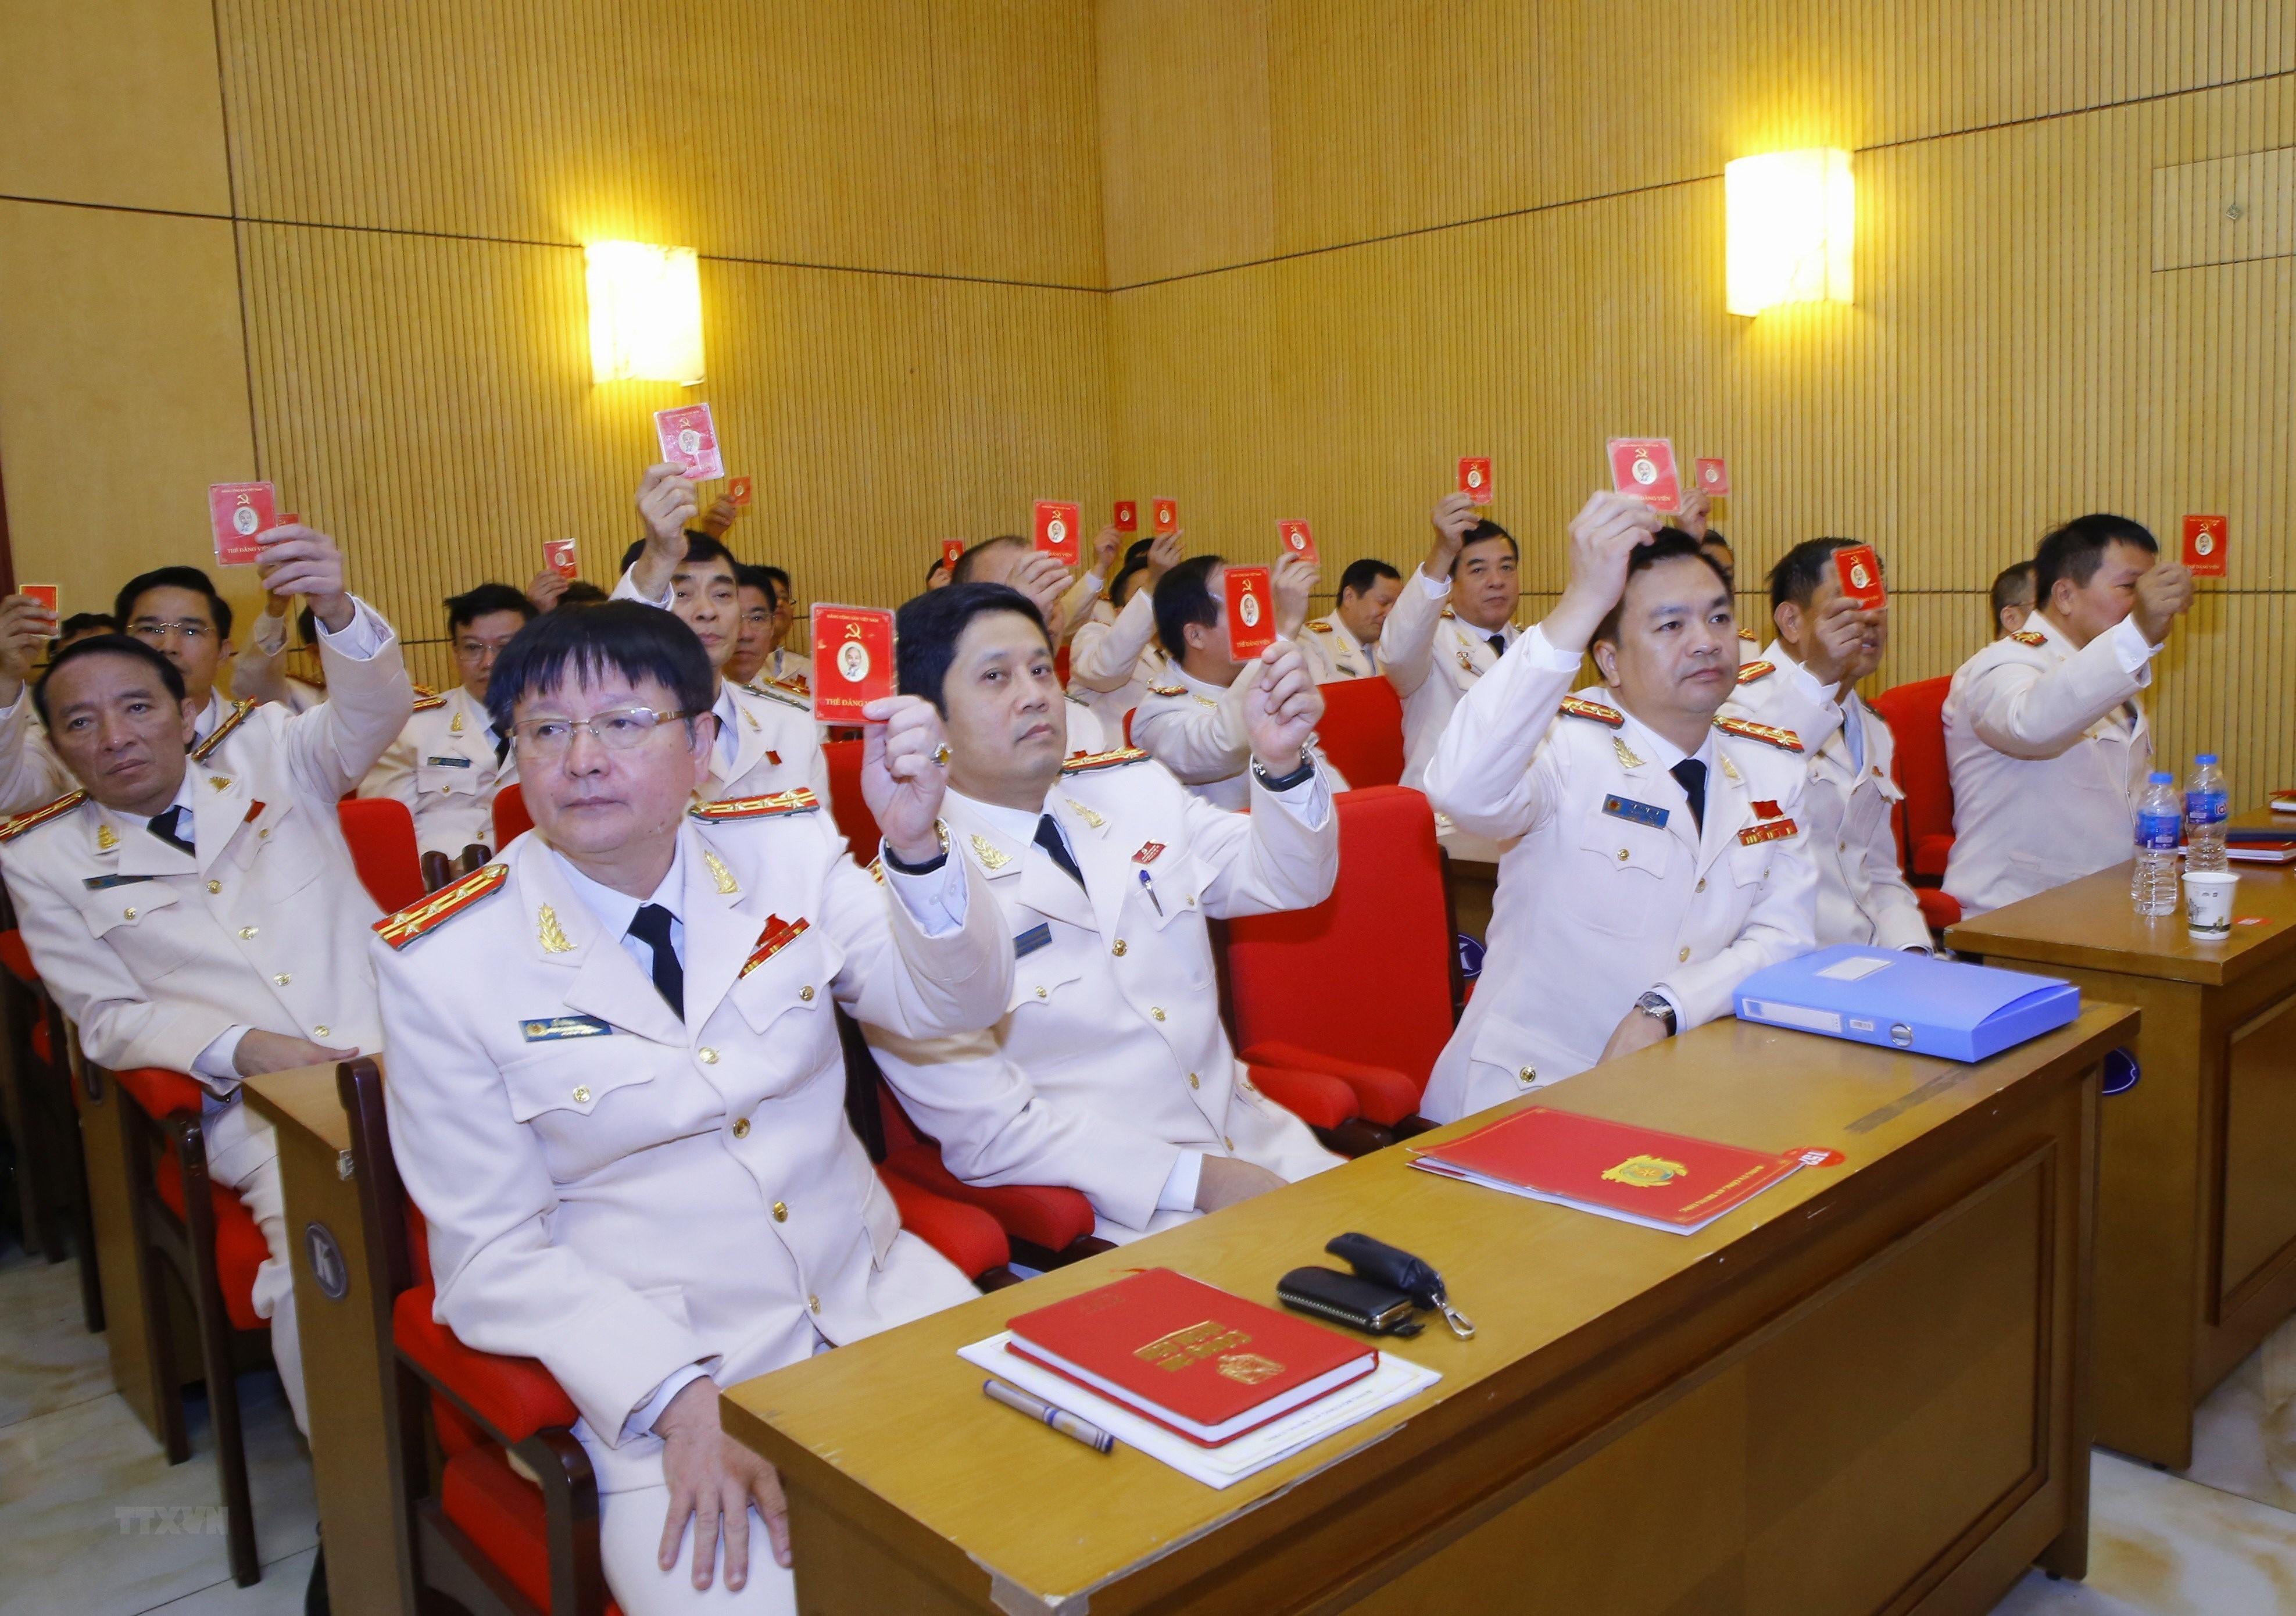 [Photo] Dai hoi dai bieu Dang bo Cong an Trung uong lan thu VII hinh anh 3